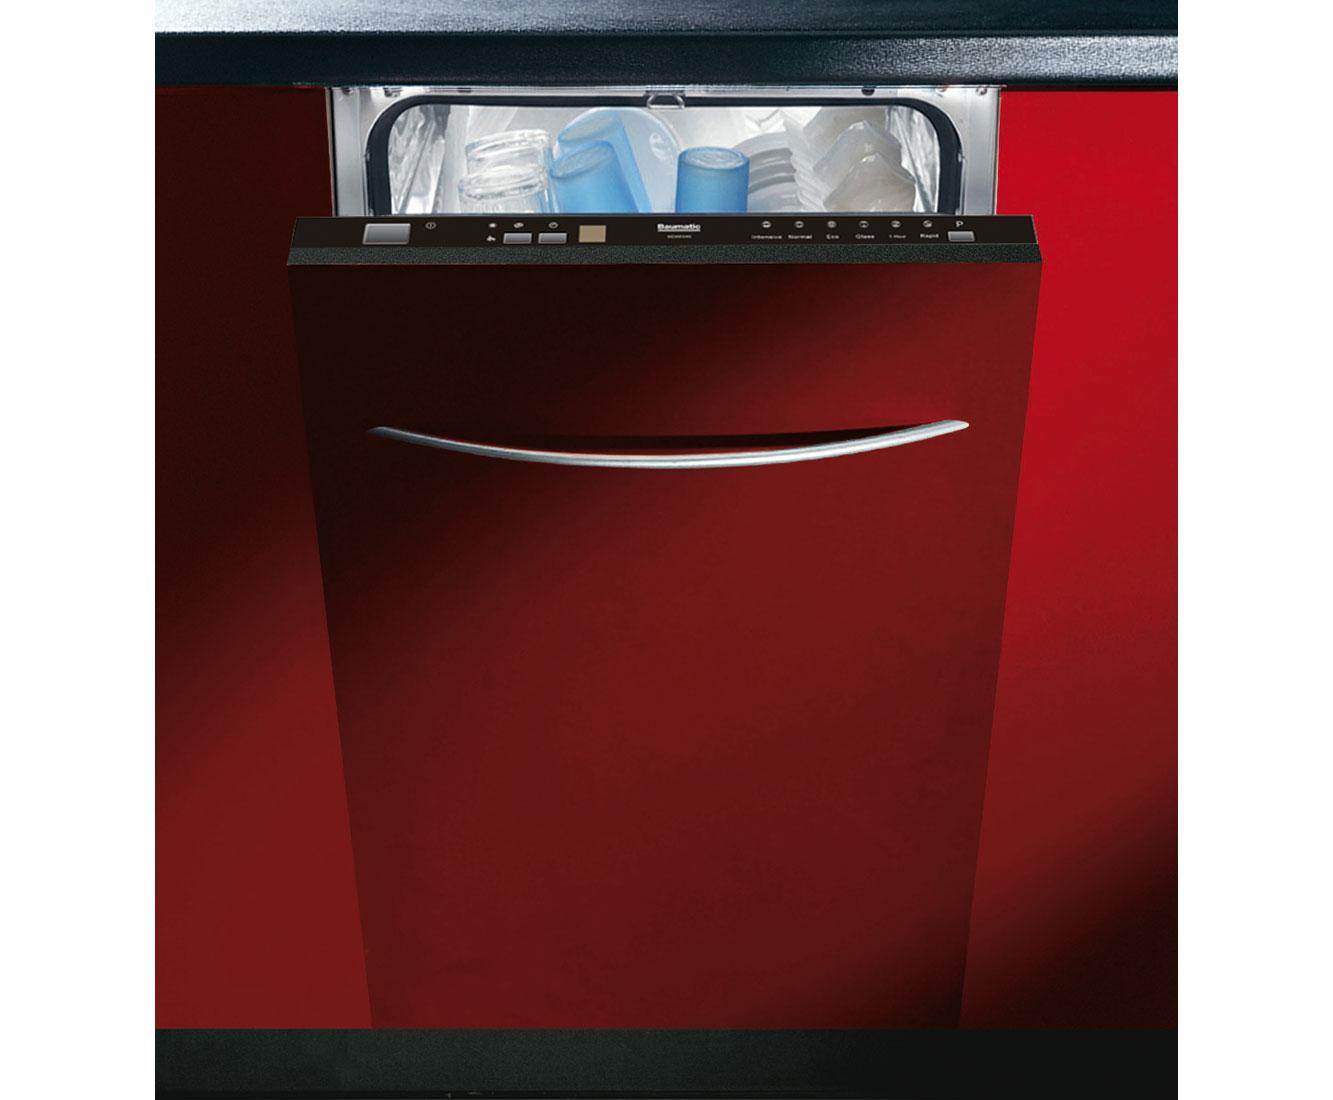 Baumatic BDWI440 Integrated Slimline Dishwasher in Black